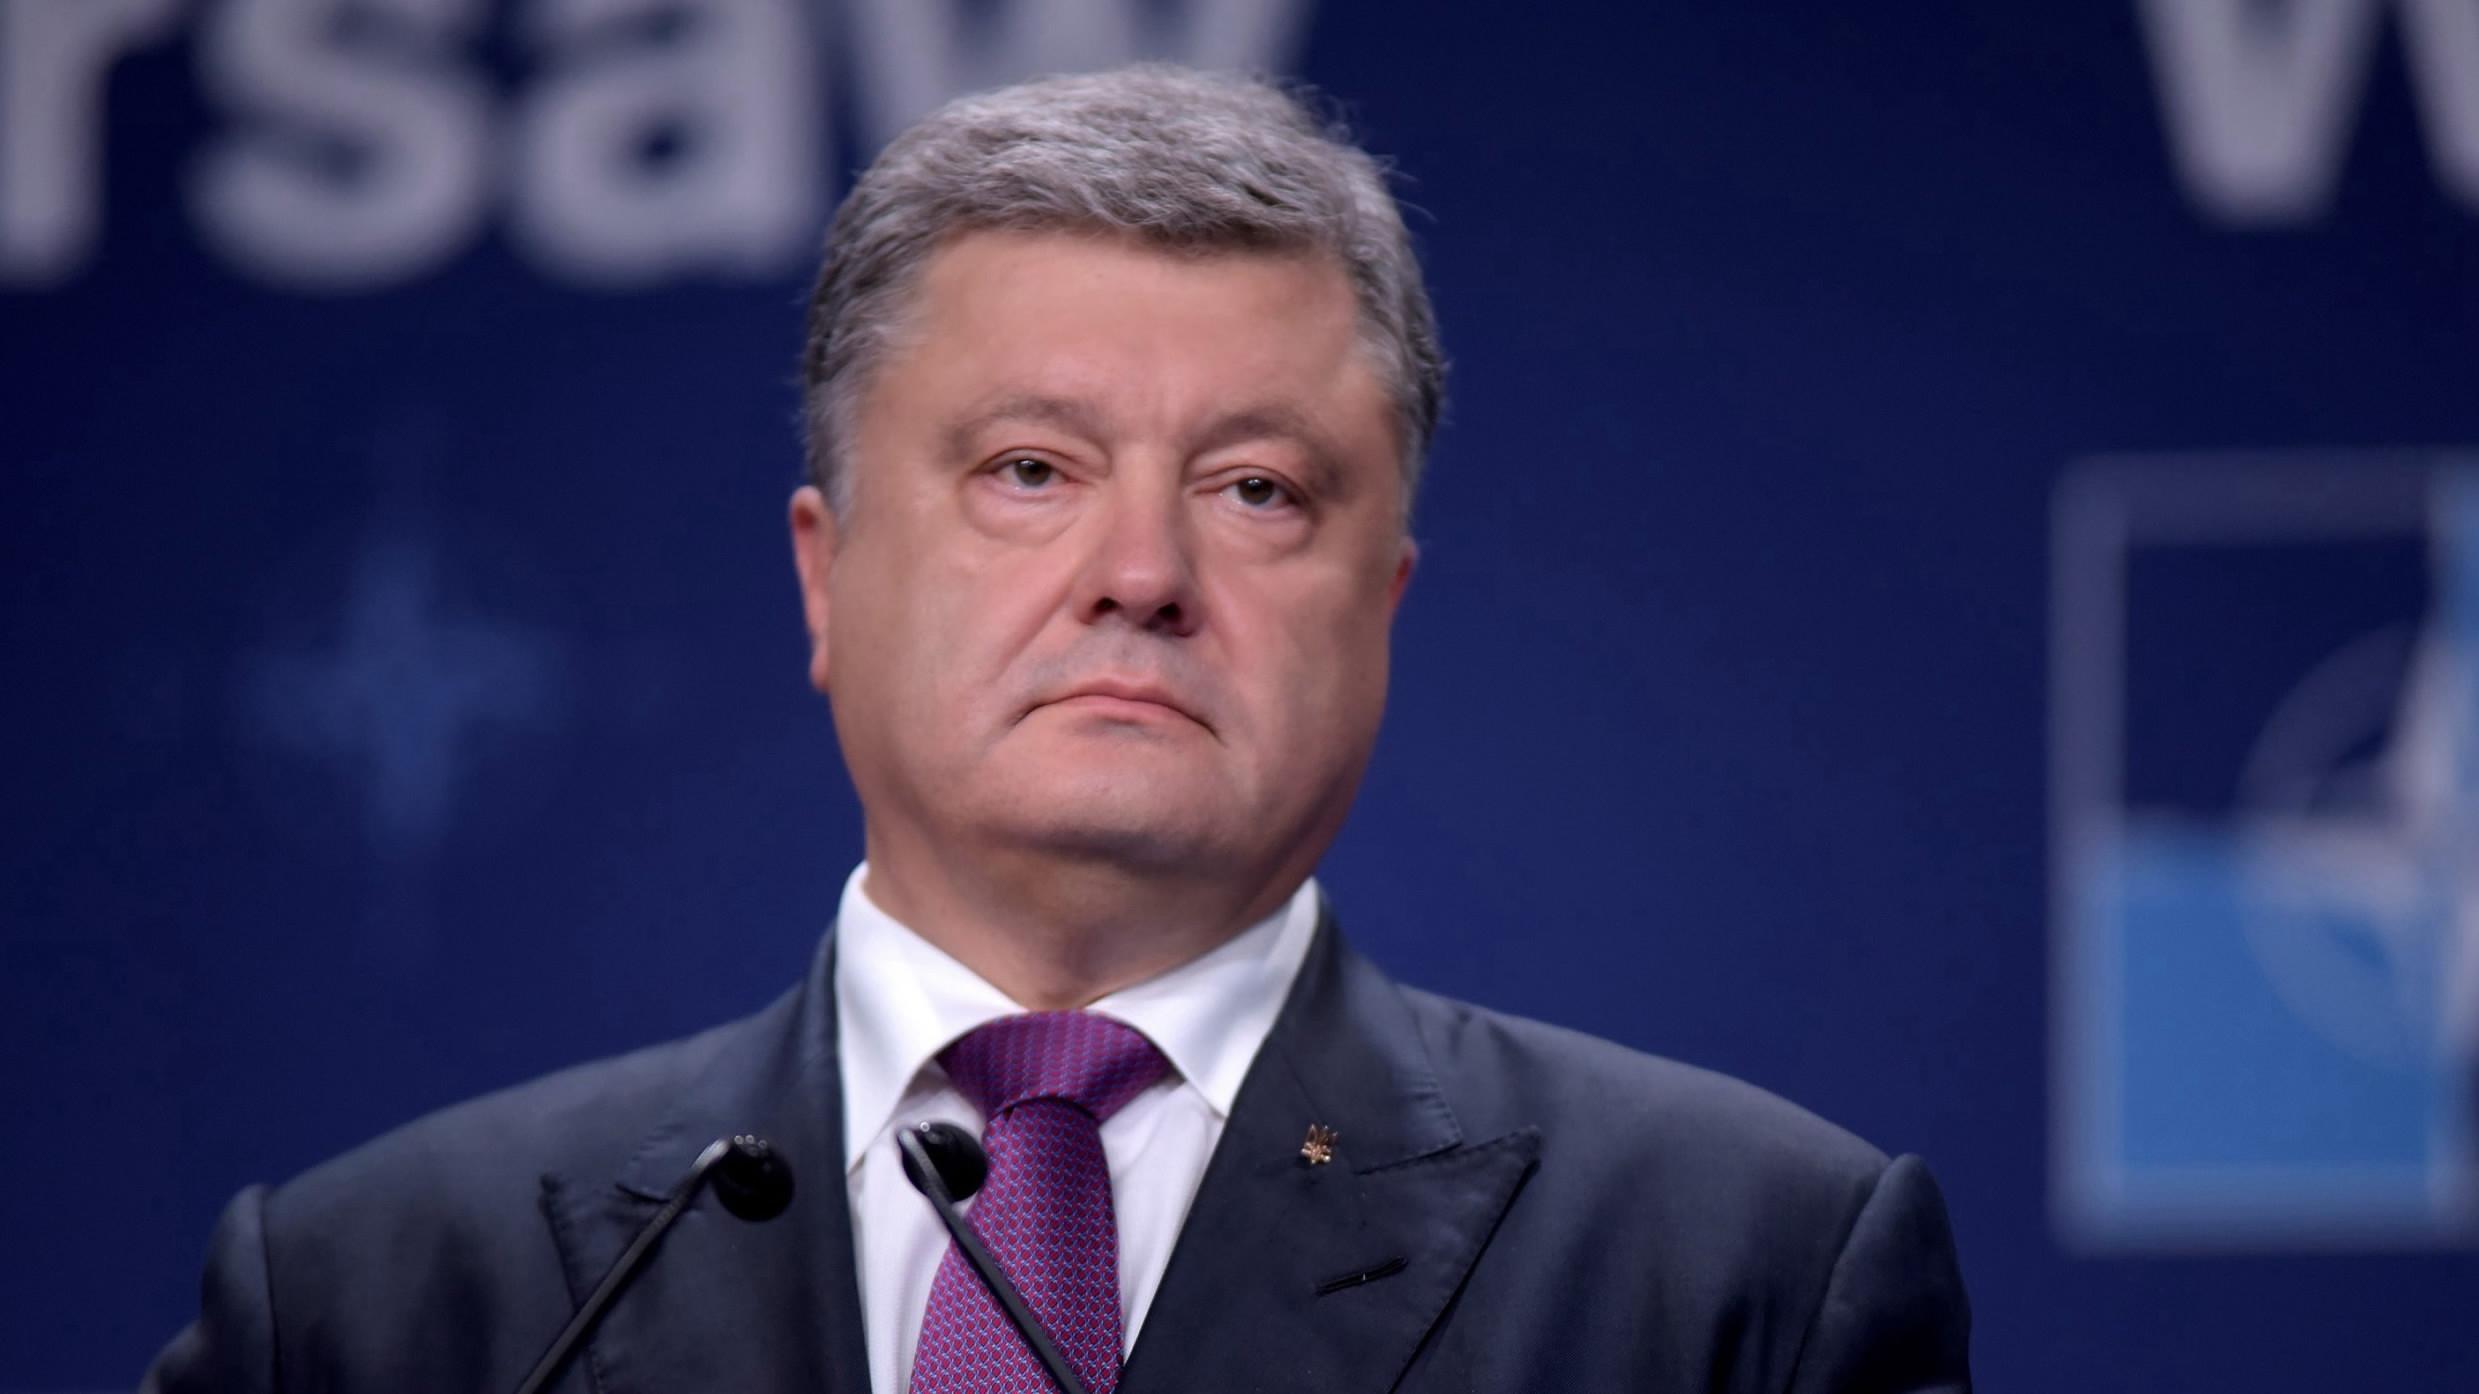 Ukrainian President Petro Poroshenko CGTN.jpg